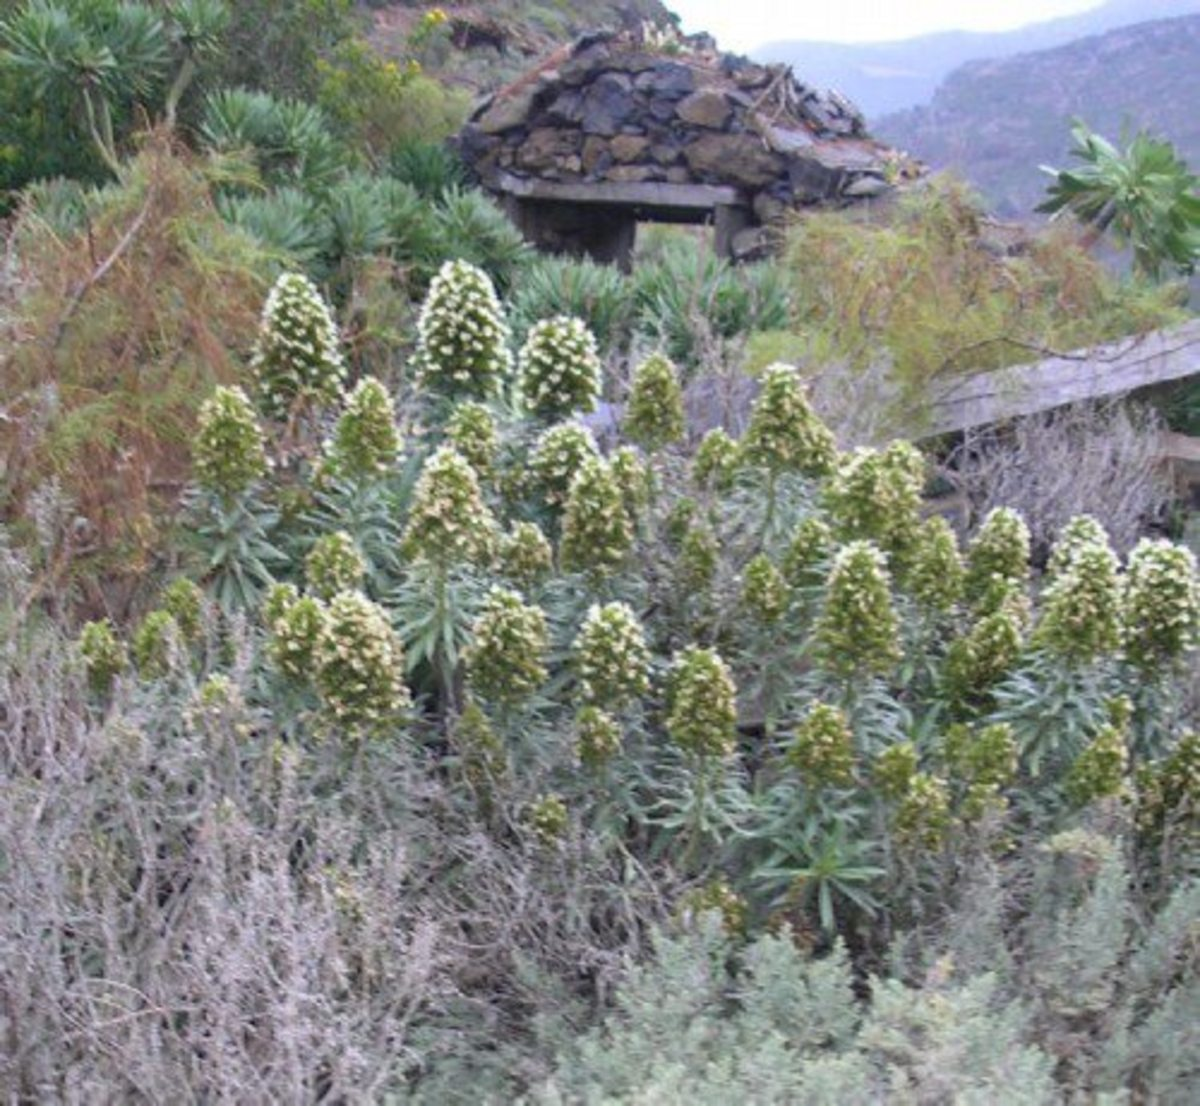 Echium giganteum growing on a cliff